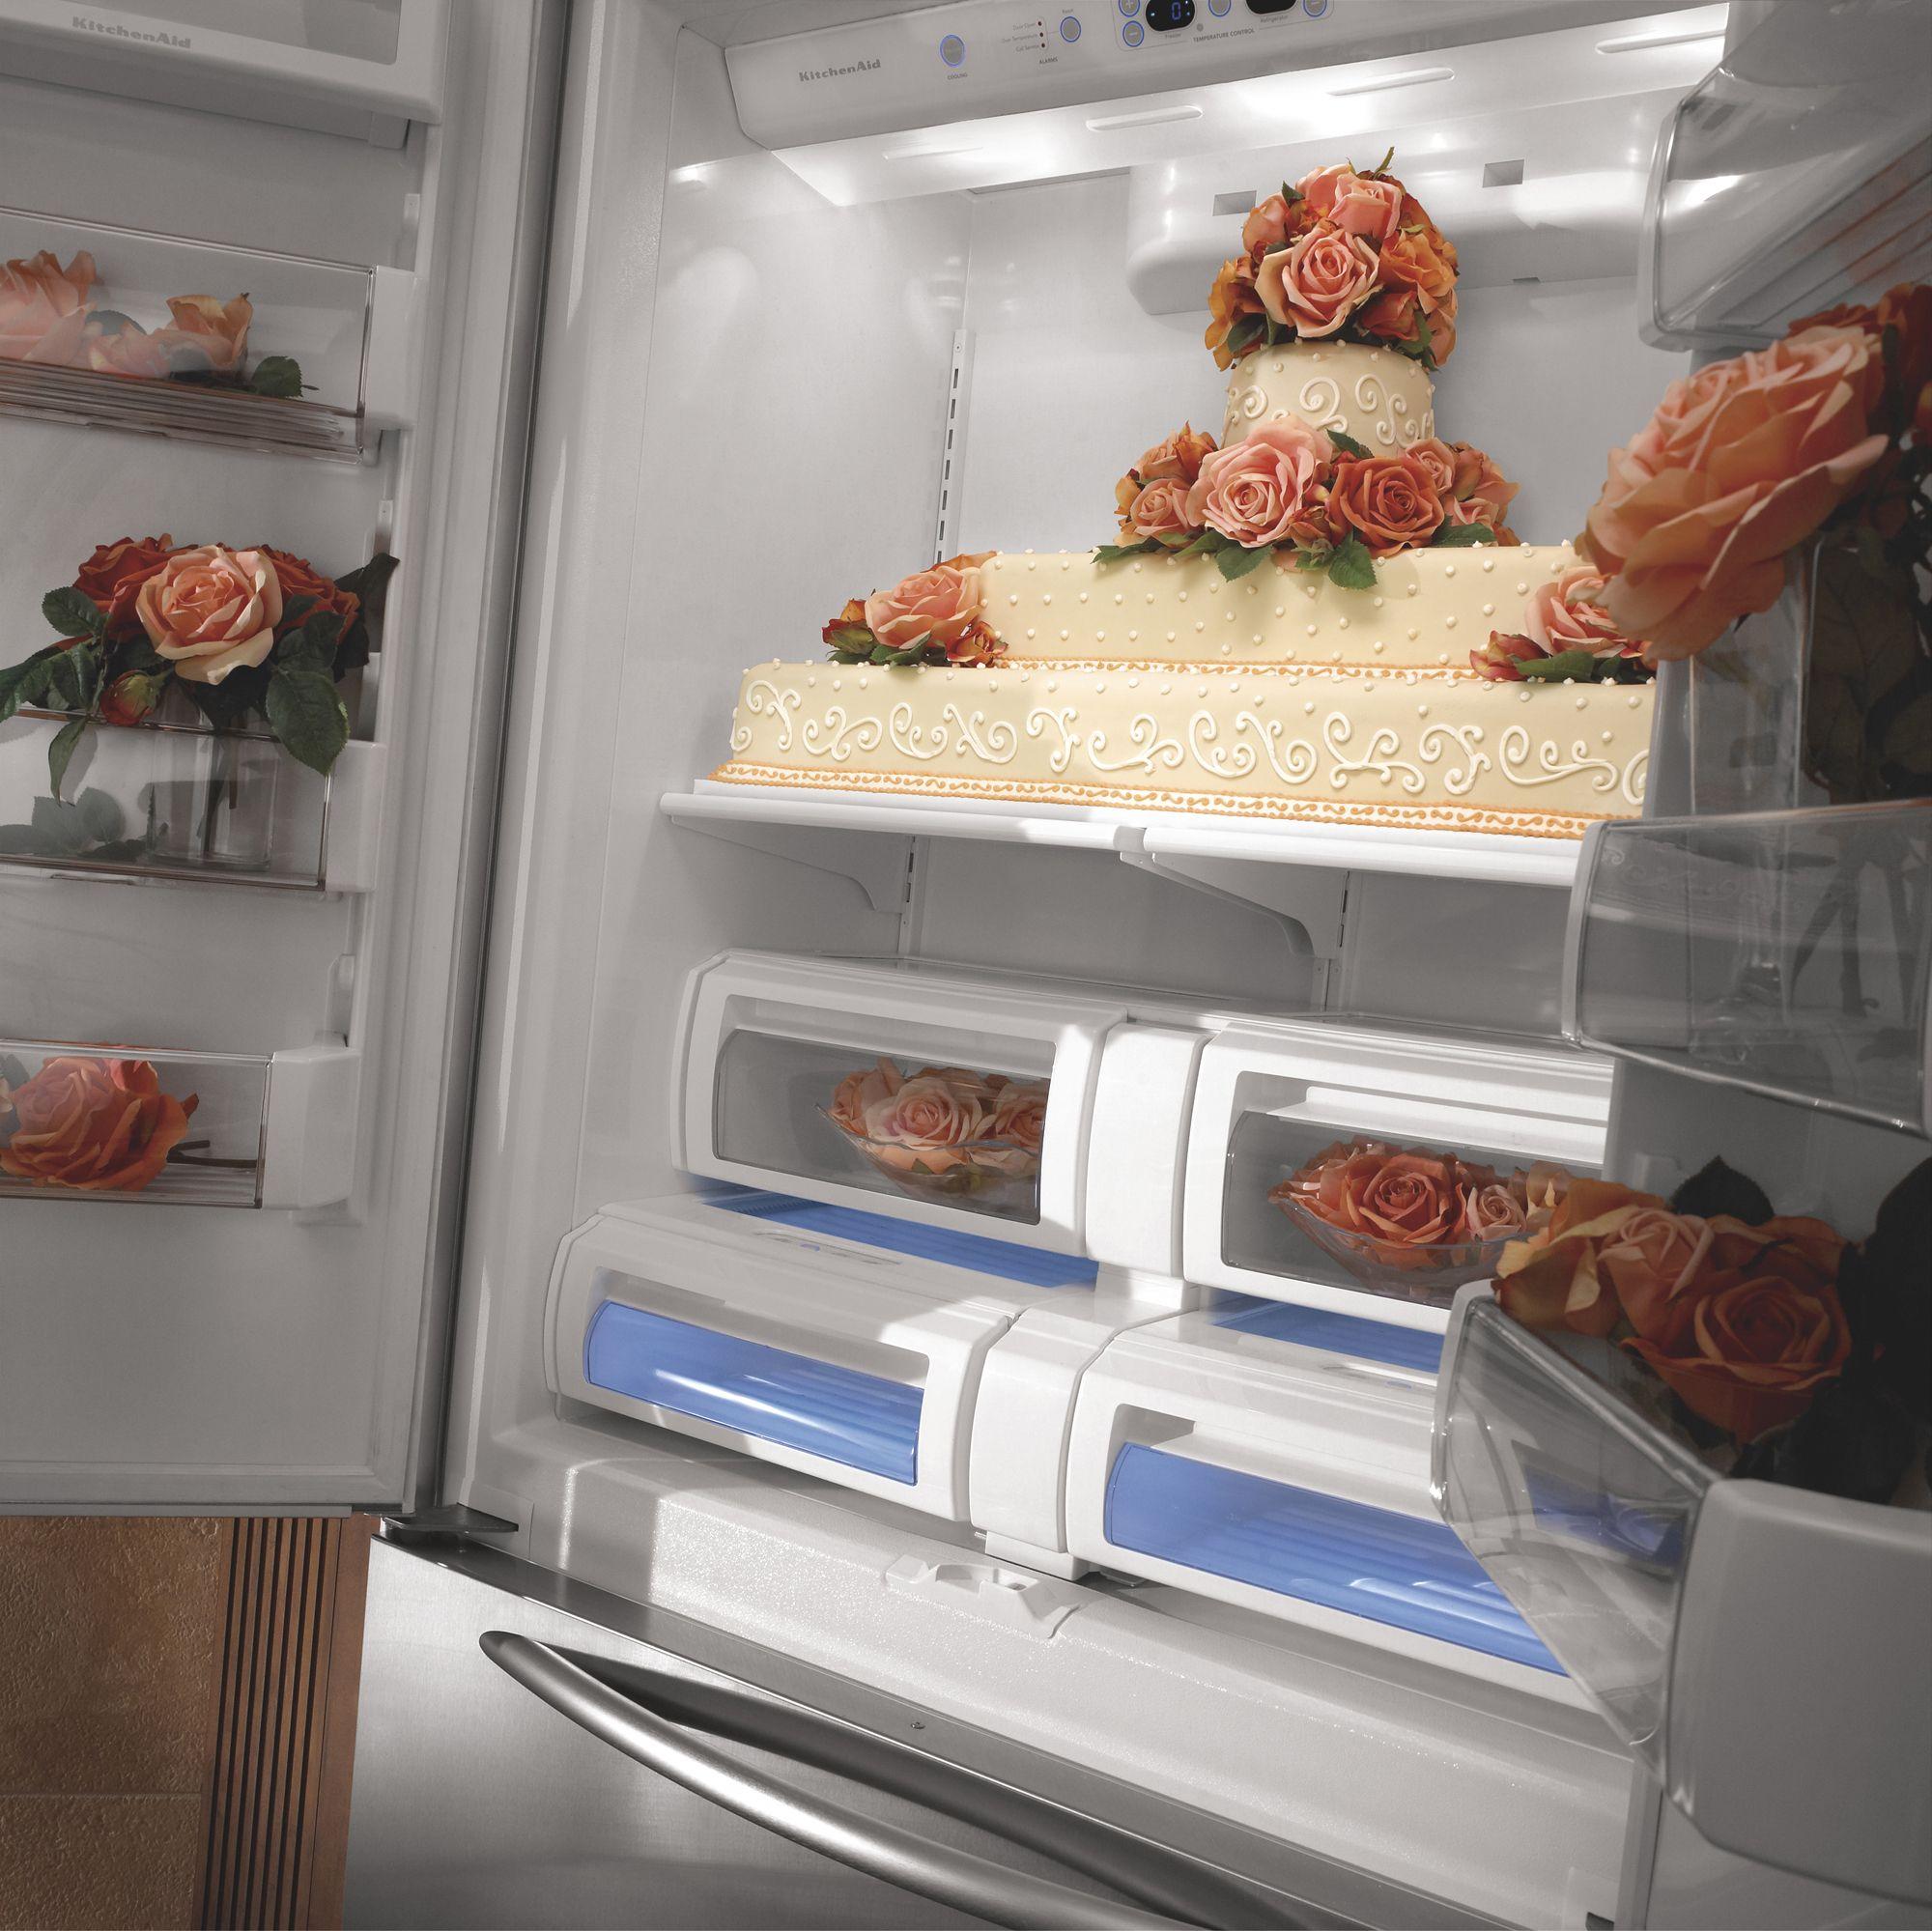 KitchenAid 22.6 cu. ft. Counter-Depth Built-In French-Door Bottom Freezer Refrigerator